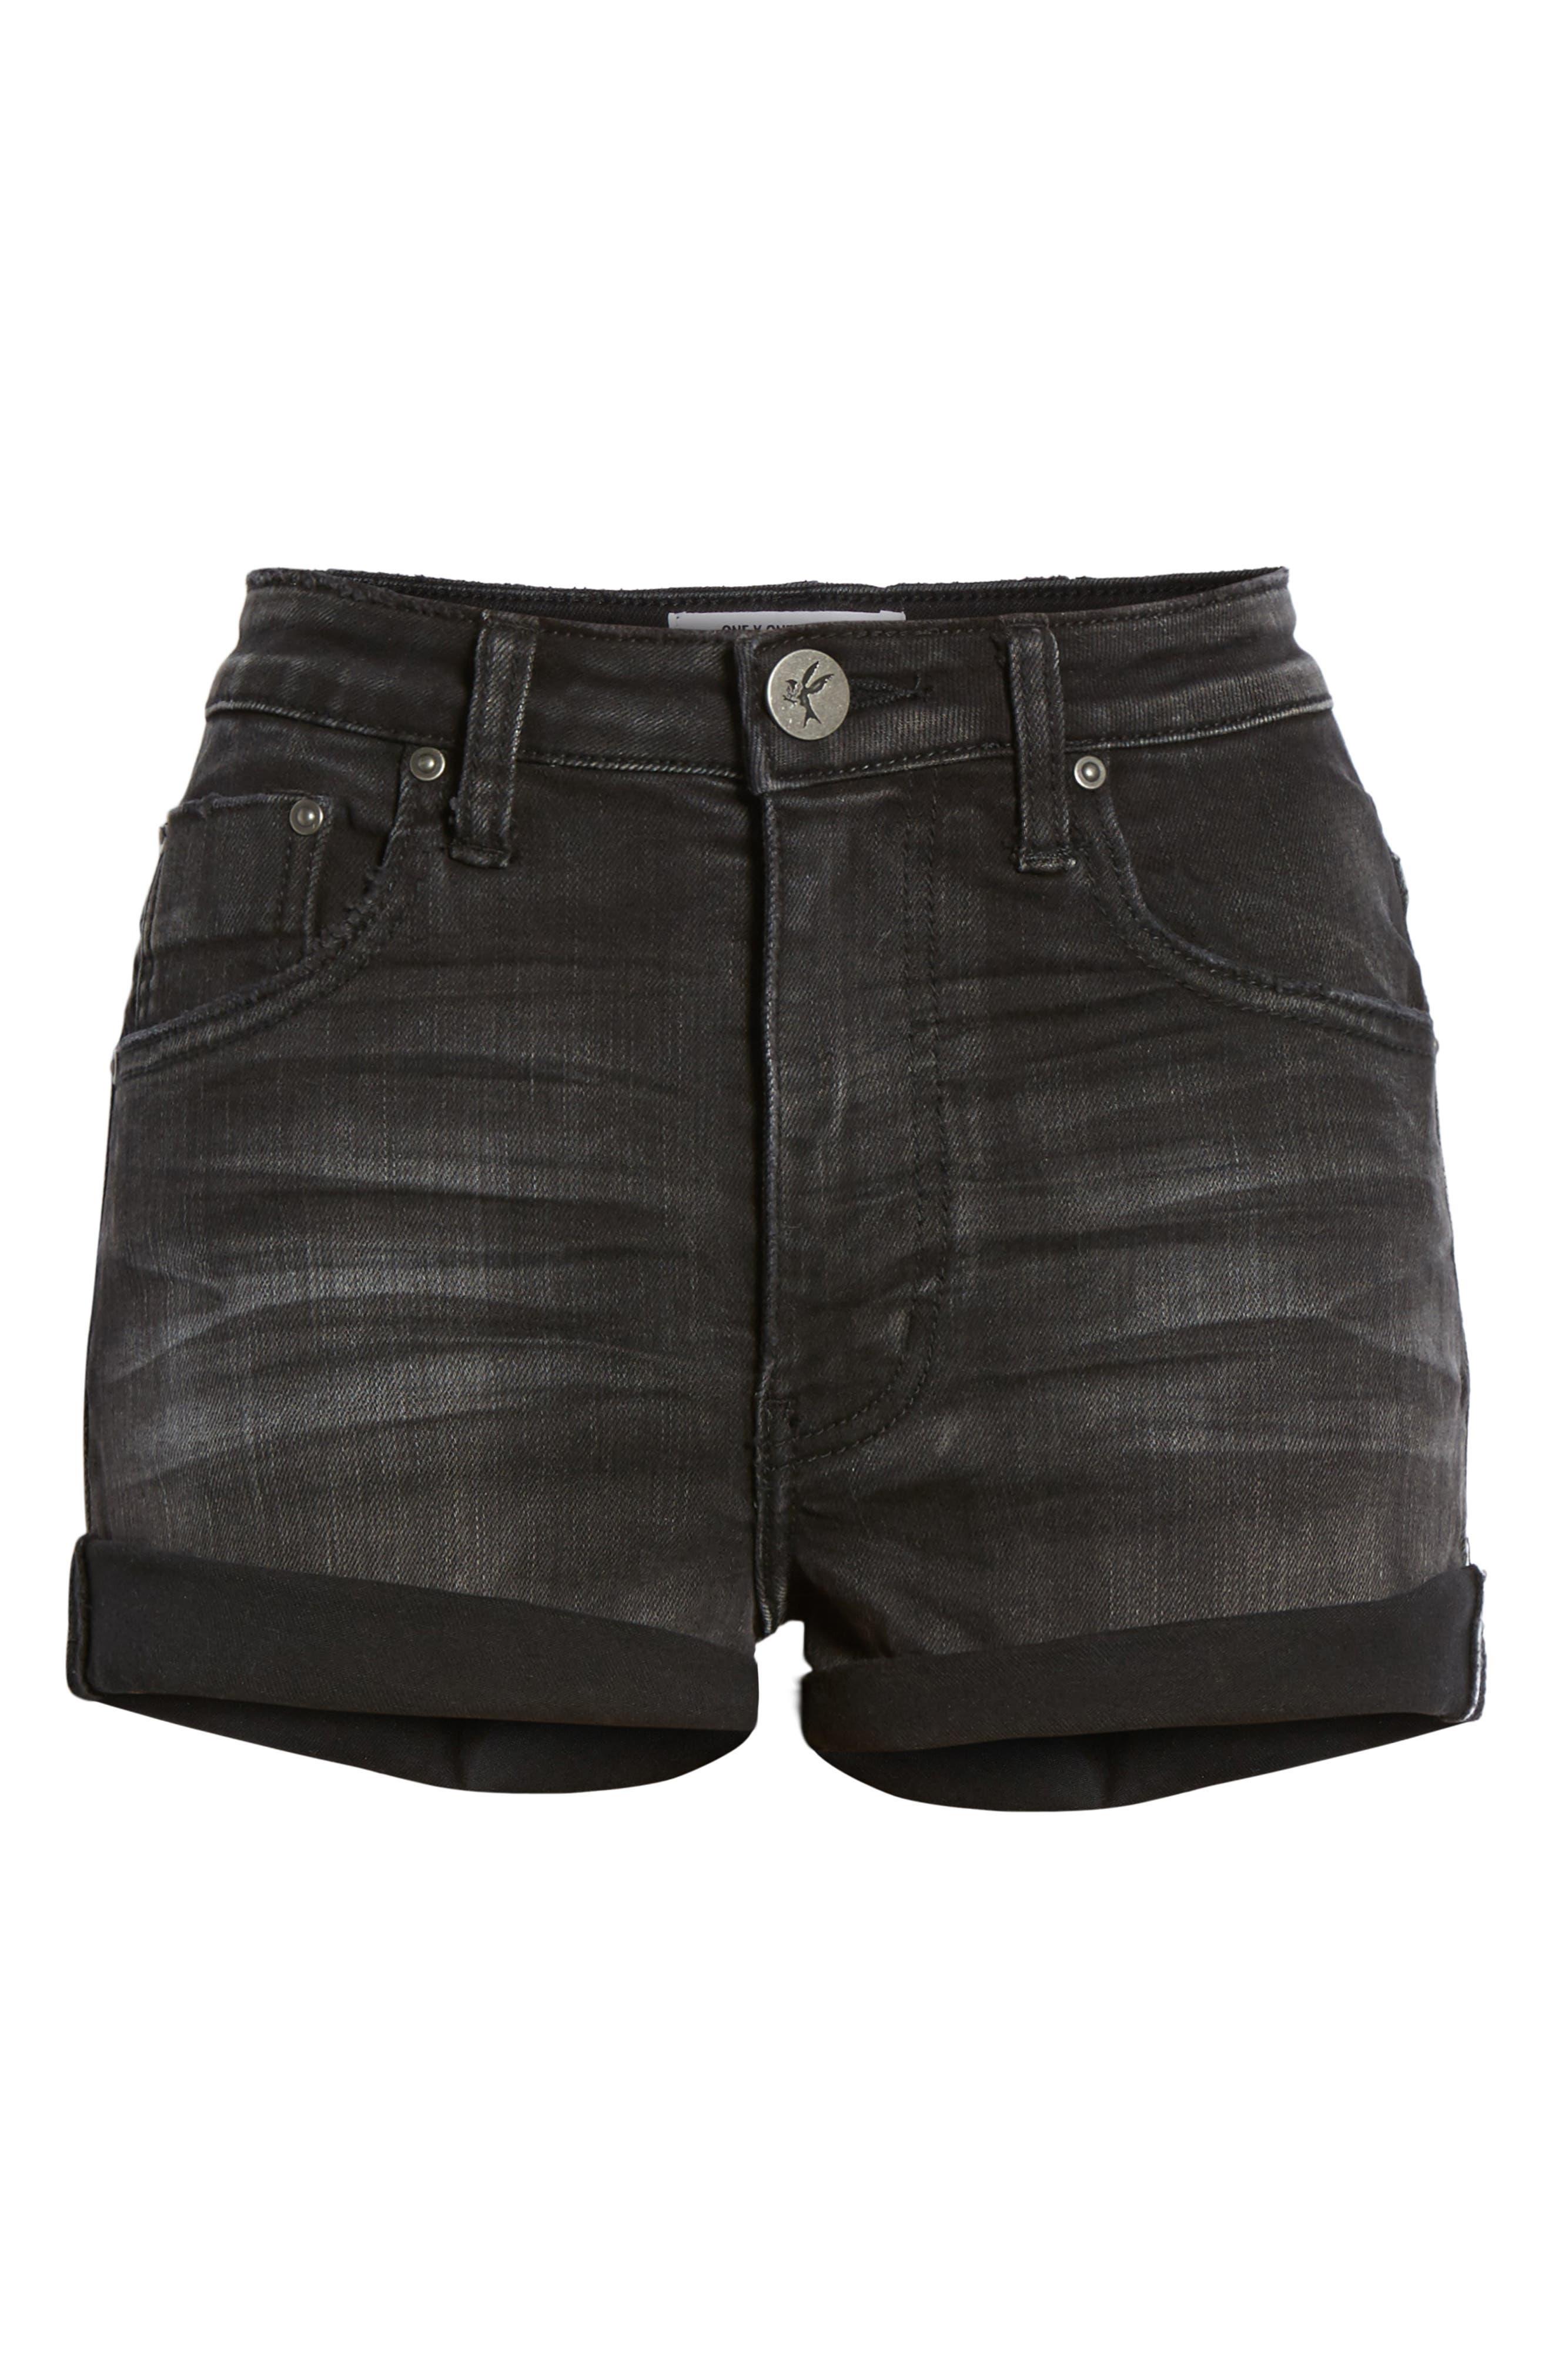 Harlets Cuffed Denim Shorts,                             Alternate thumbnail 6, color,